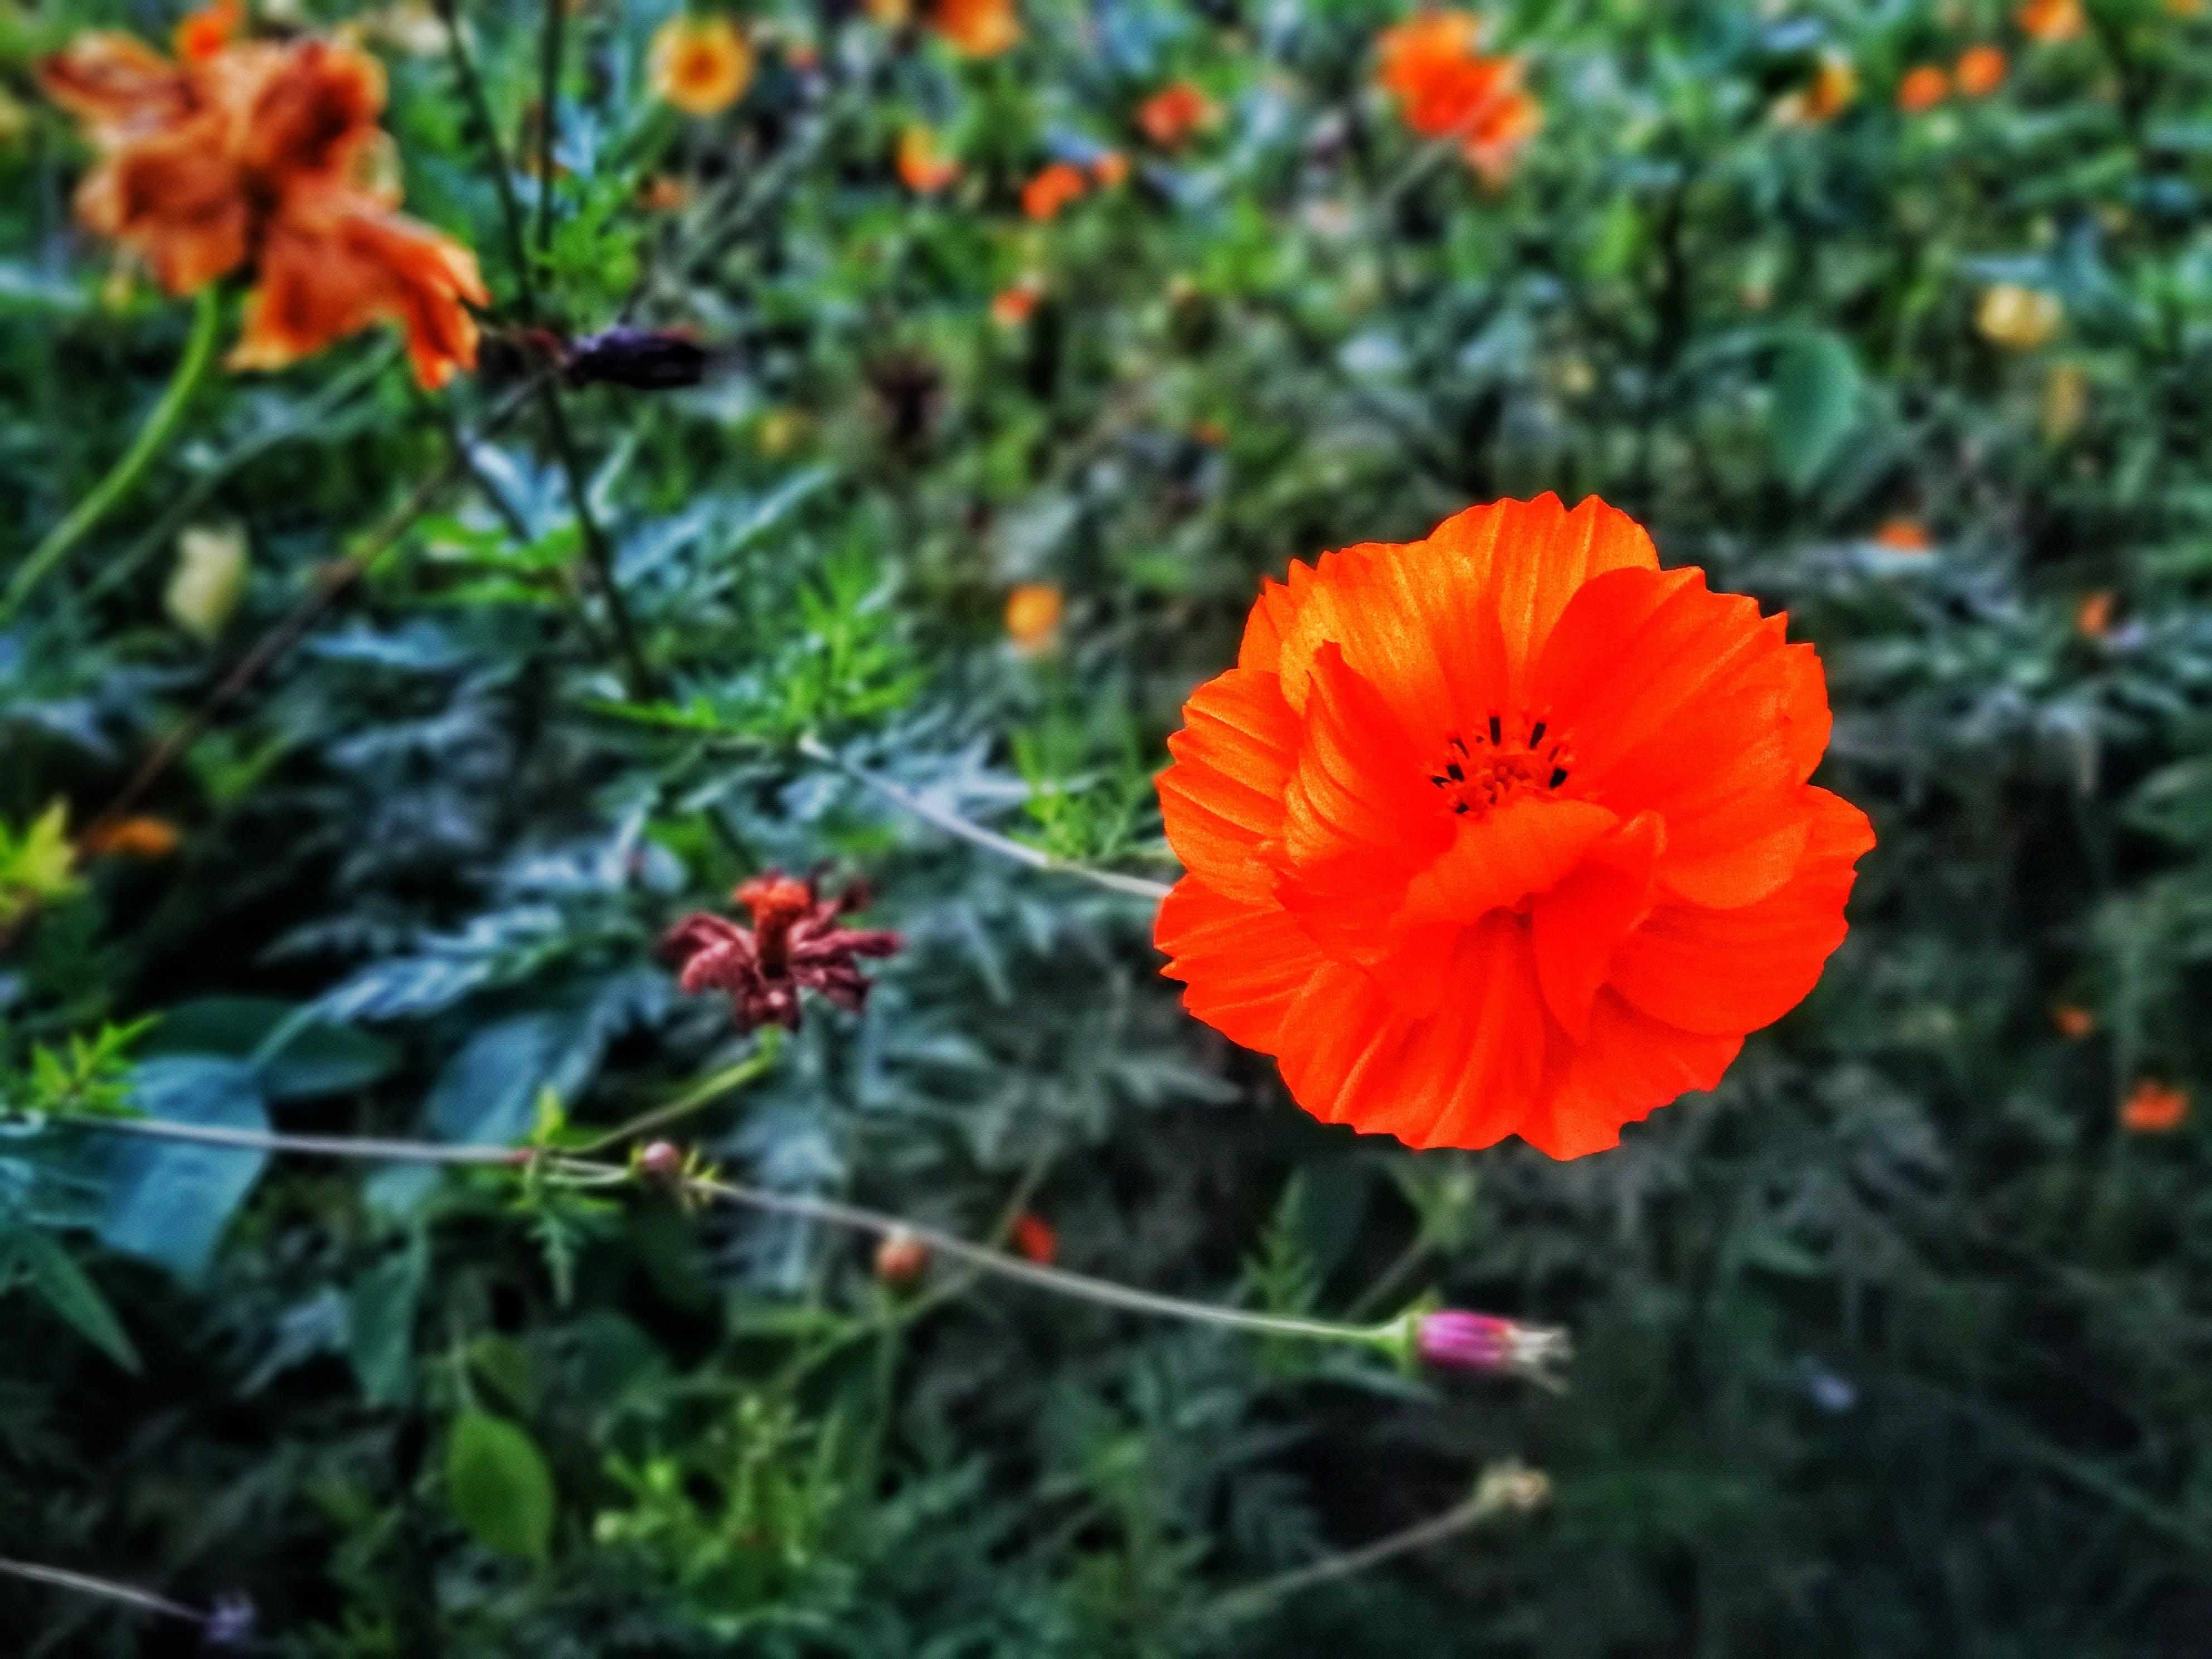 Free stock photo of #outdoorchallenge, beautiful flowers, fields, flower field